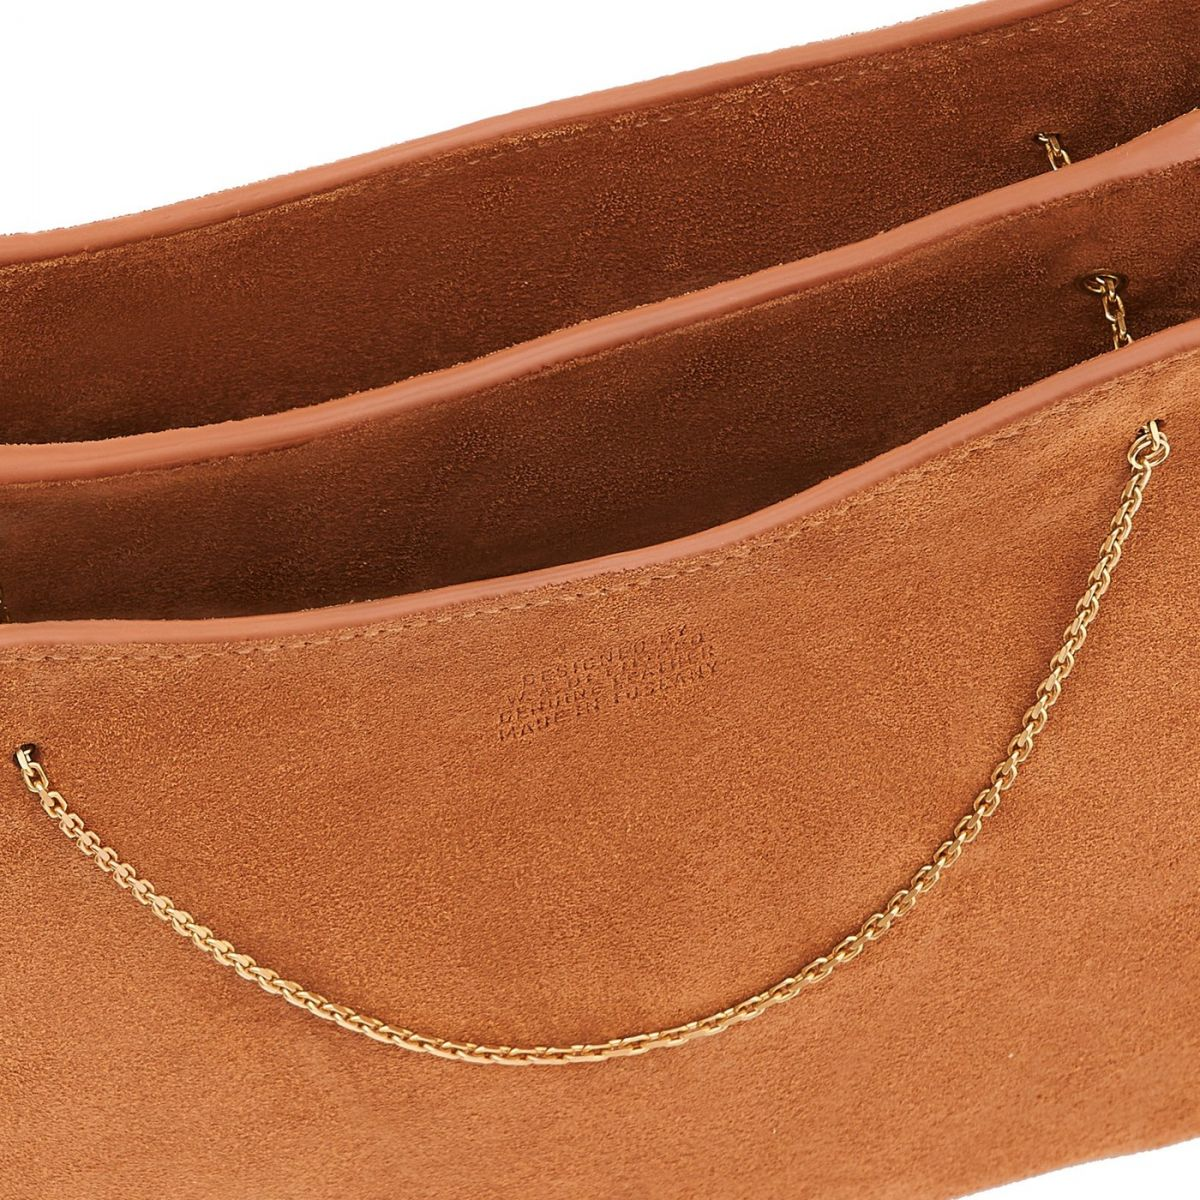 Giglio - Women's Shoulder Bag in Re-Suede color Tobacco - Mediterranea line BSH132 | Details